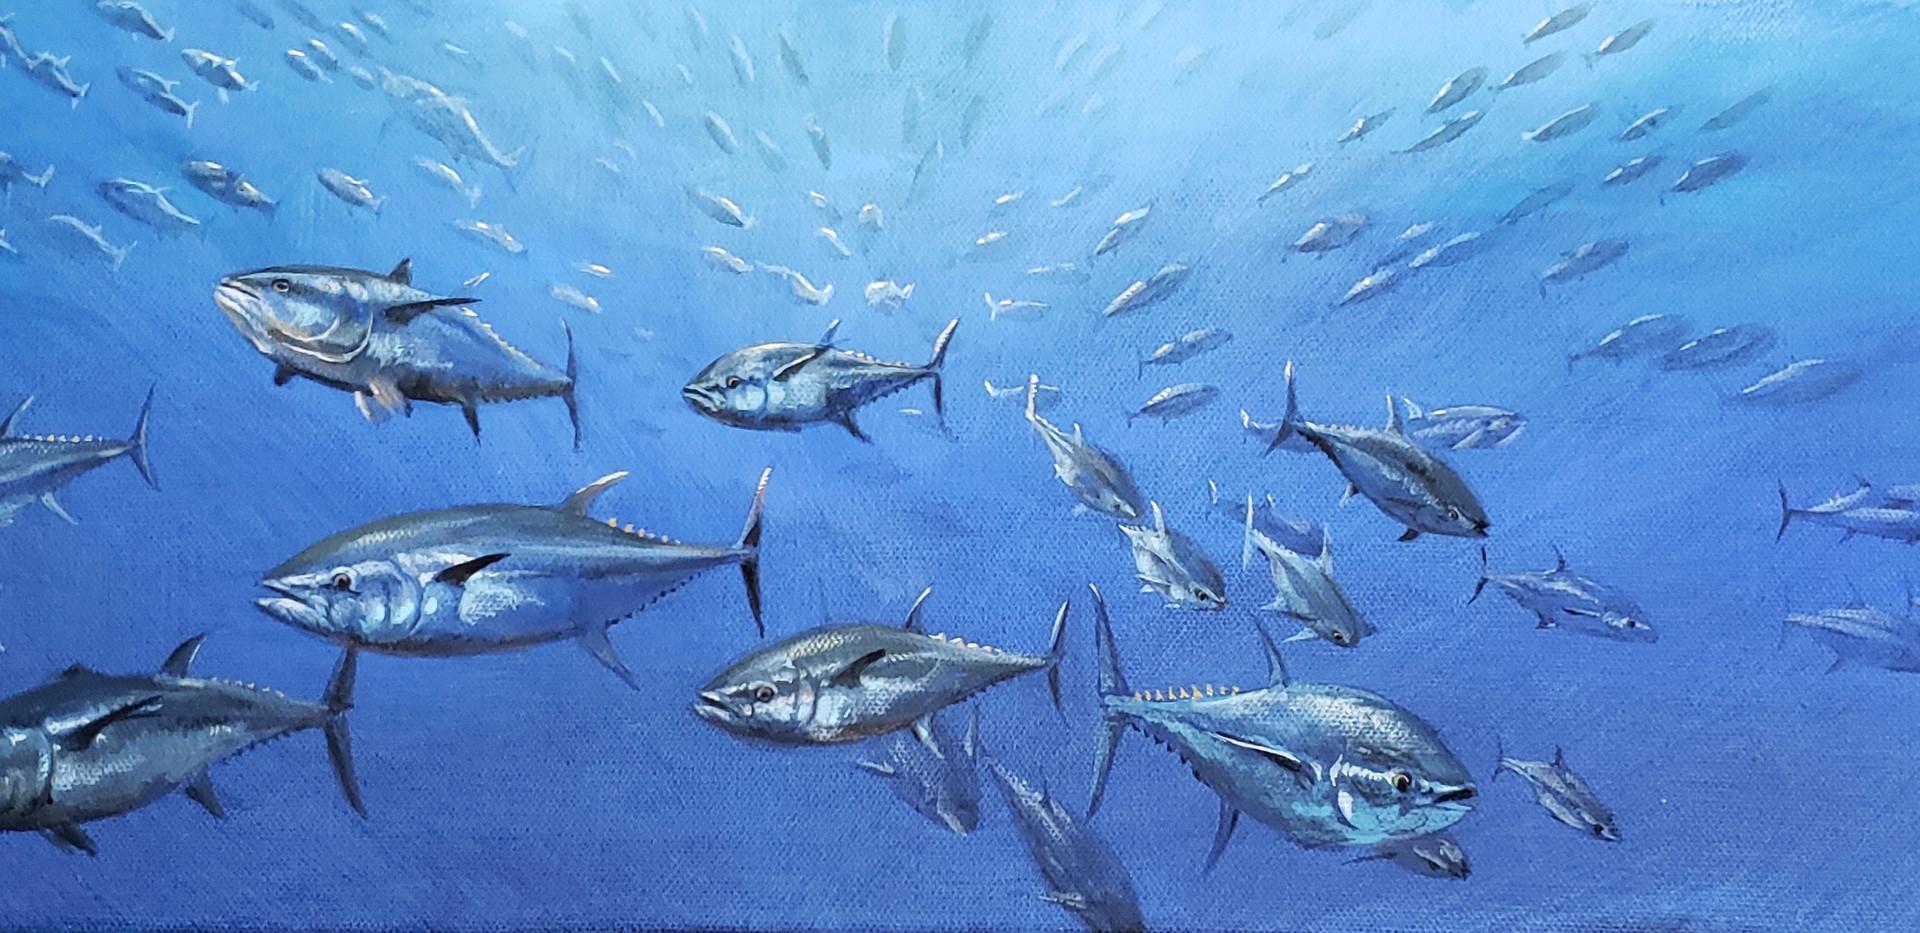 Shoal of Blue Fin Tuna